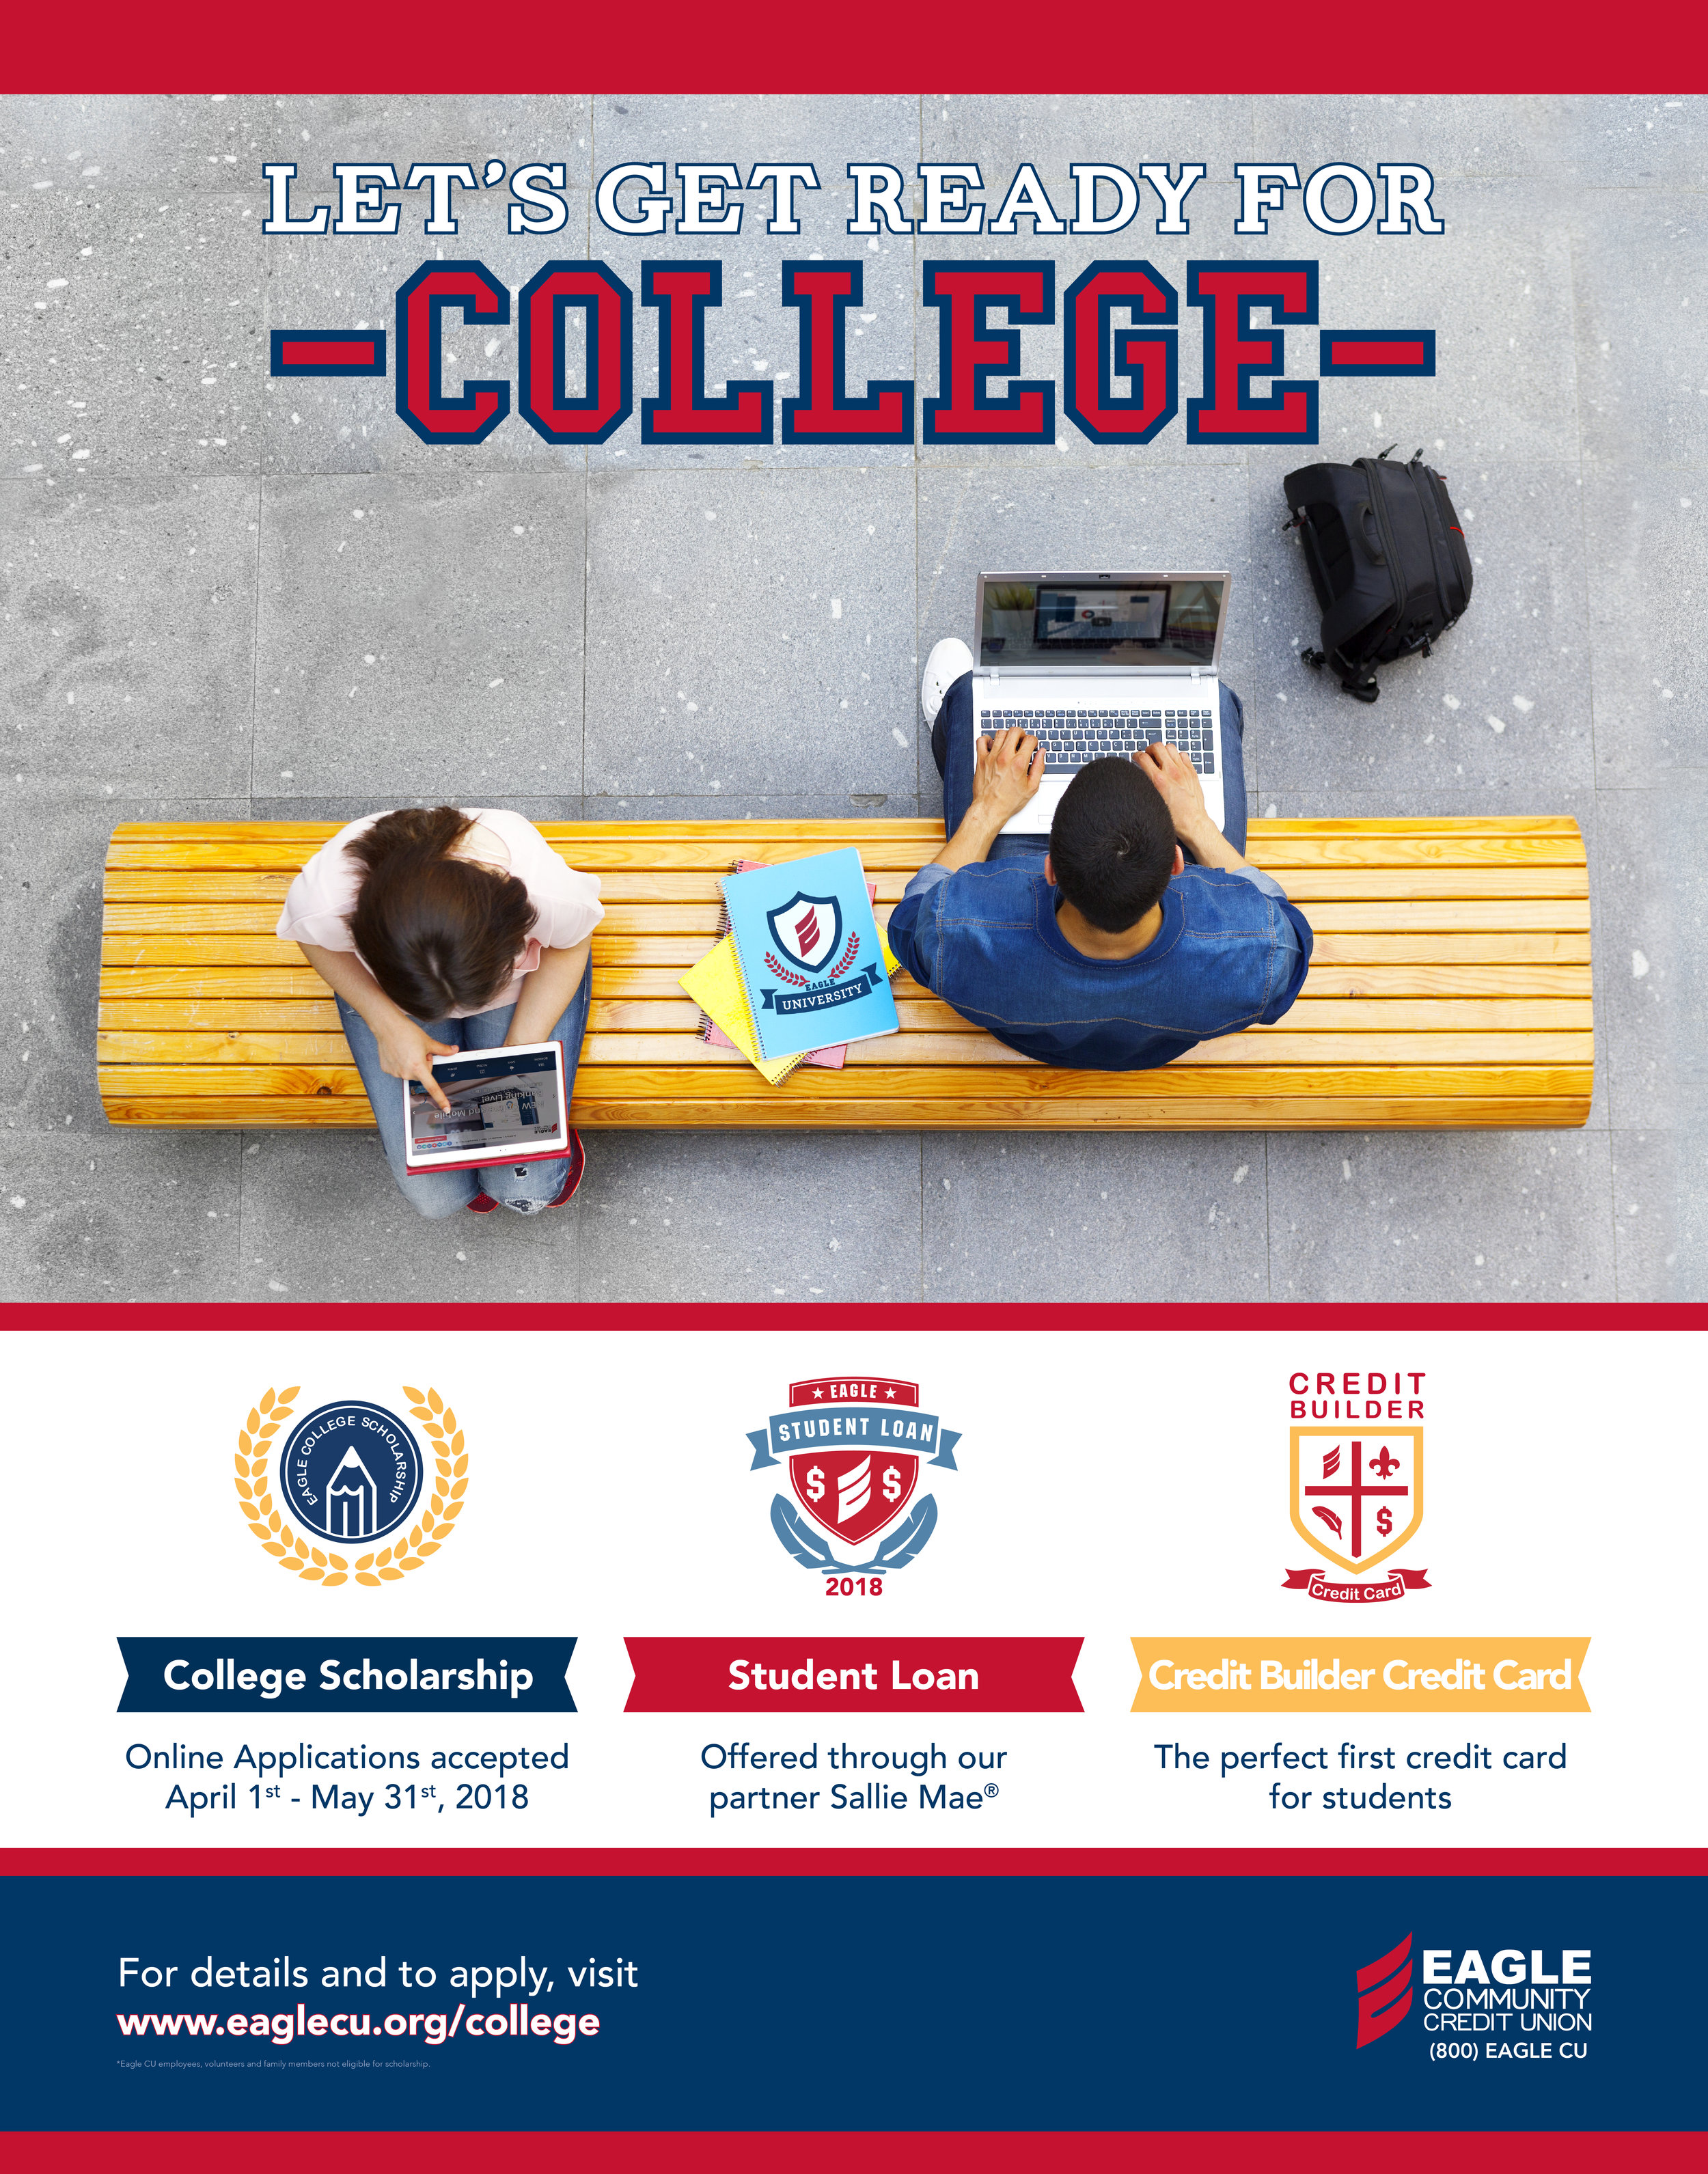 College 2018 22 x 28.jpg